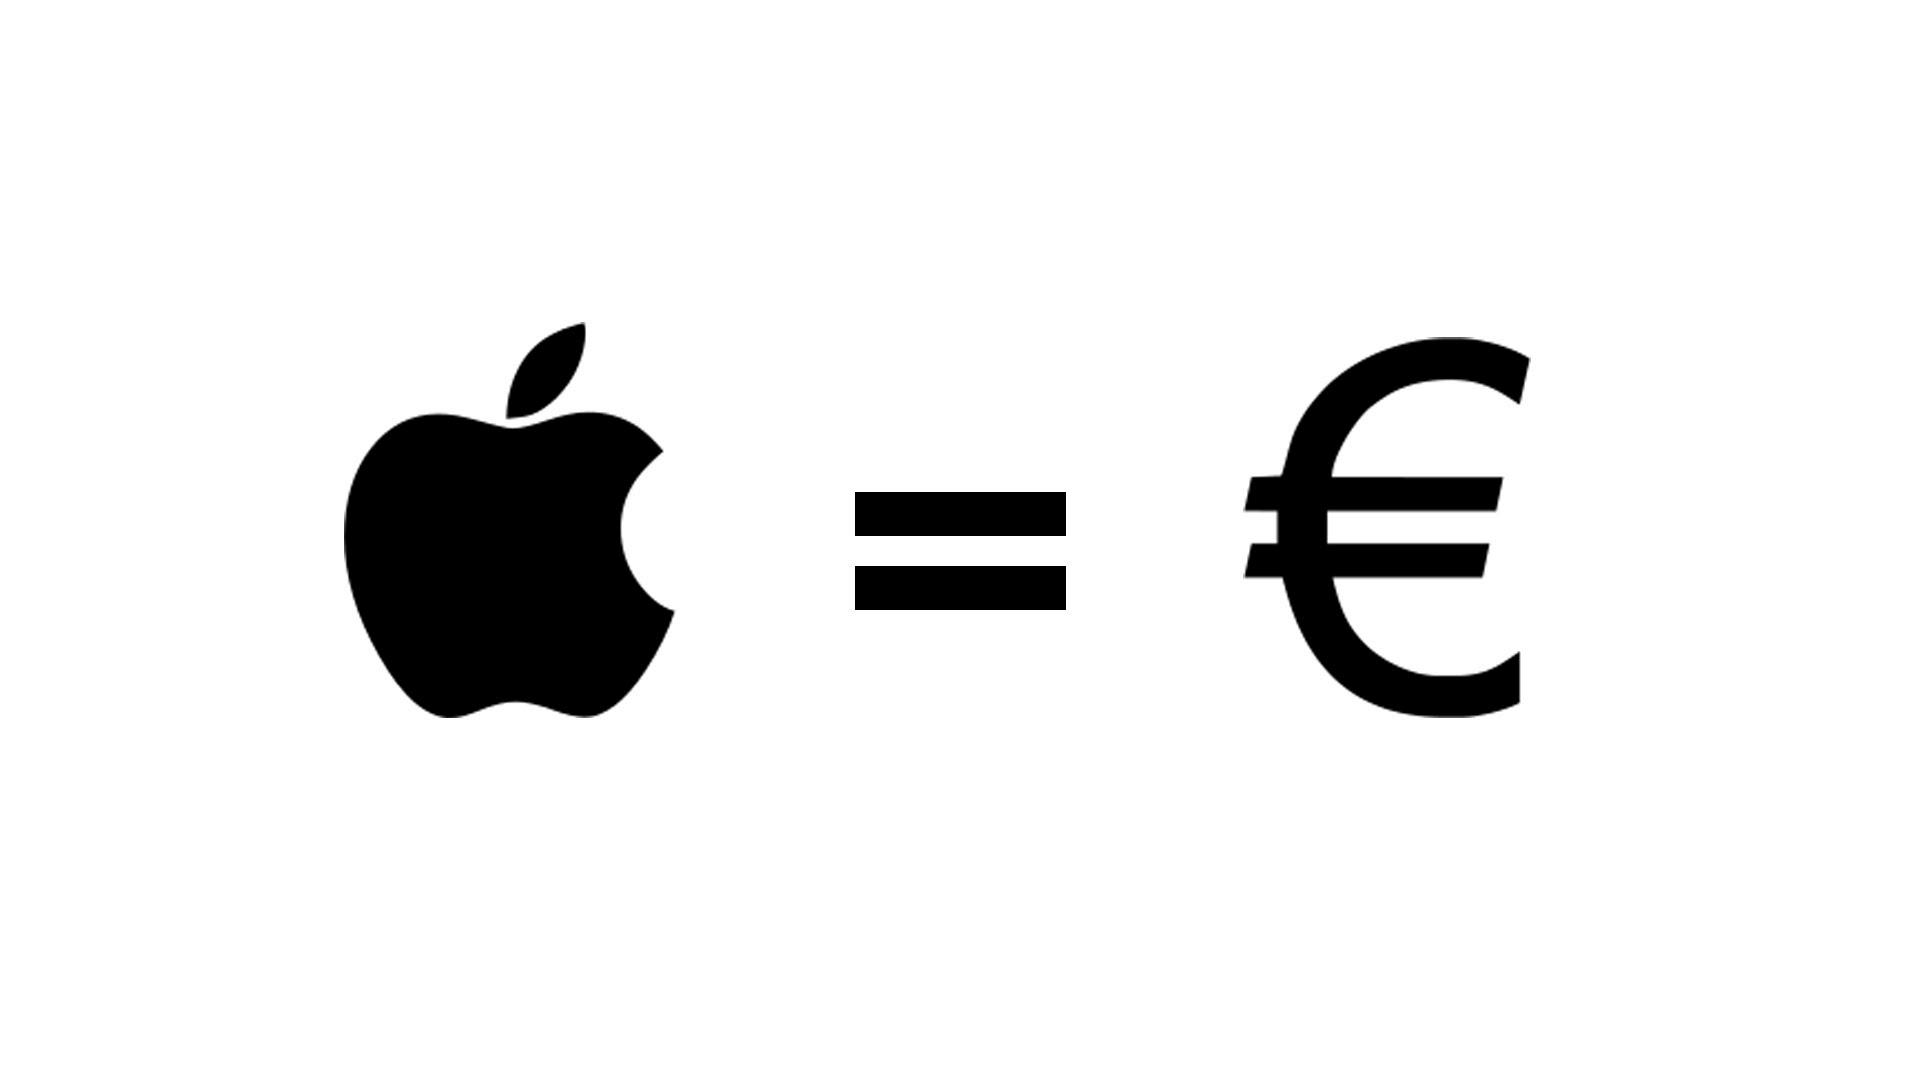 Apple Jünger